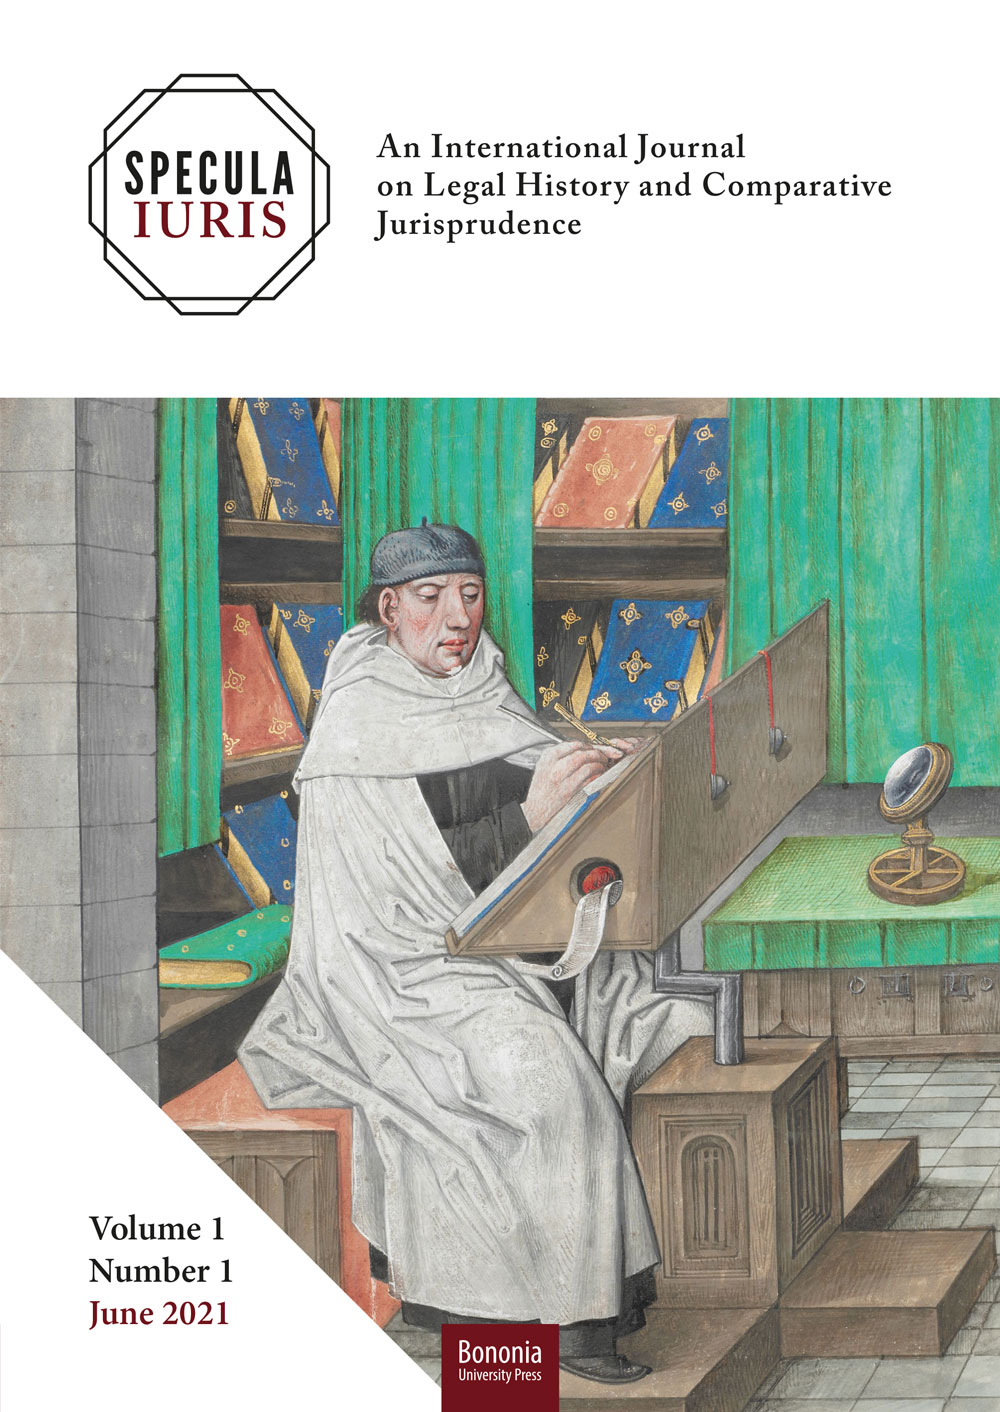 Specula Iuris Vol. 1 Numero 1 (2021) - Bononia University Press